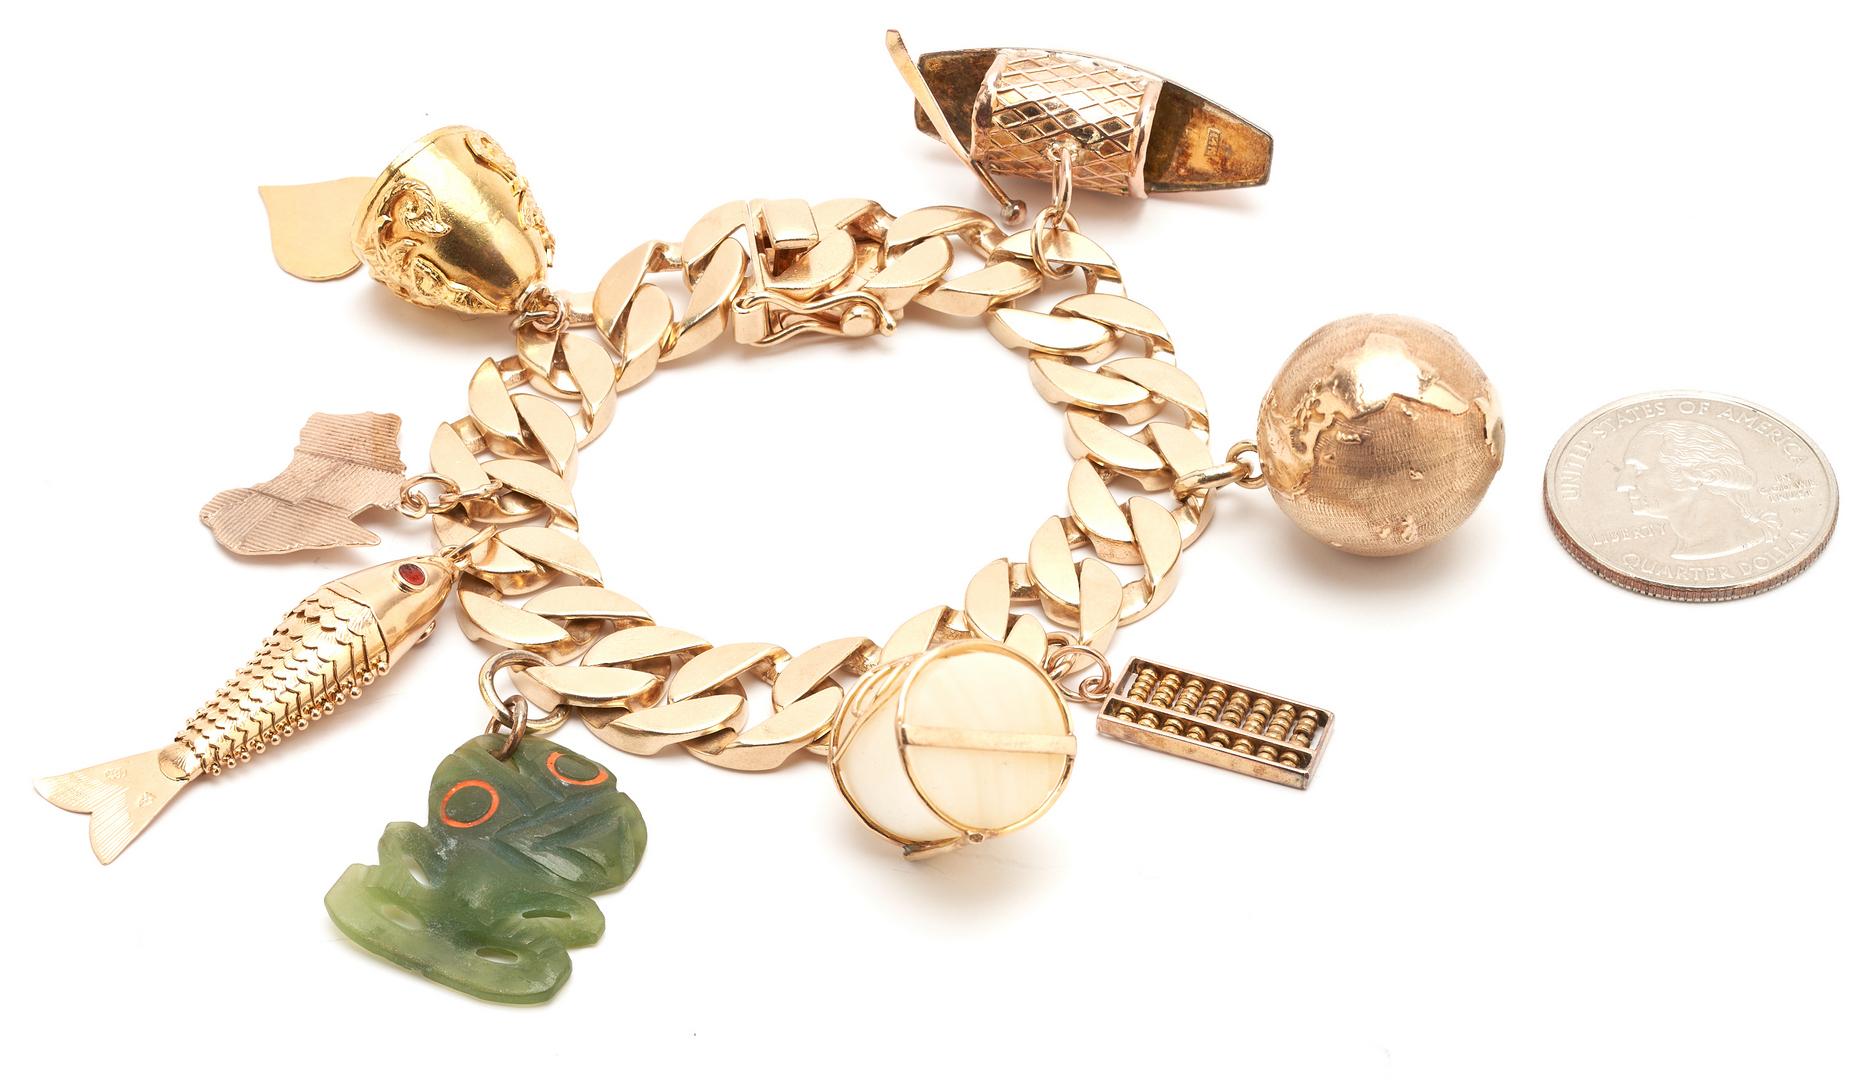 Lot 57: Ladies 14K Charm Bracelet w/ 8 Charms